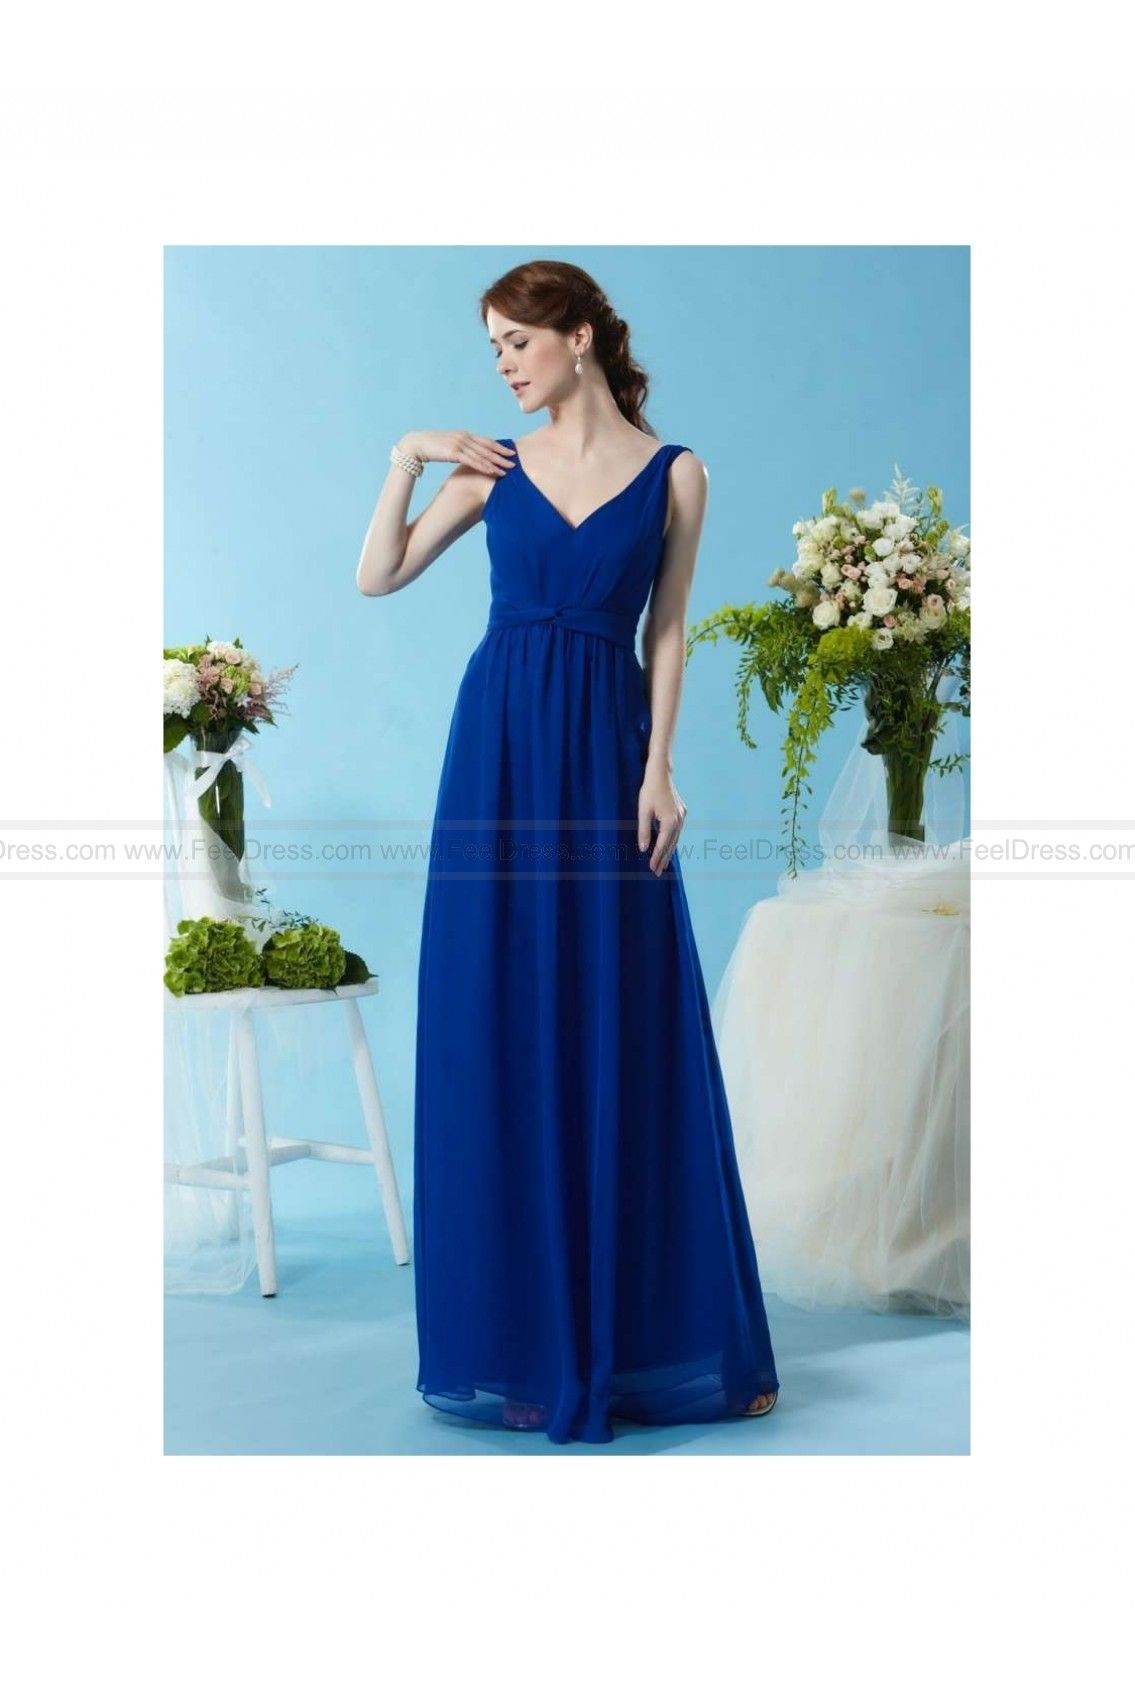 Eden bridesmaid dresses style 7450 bridesmaid dresses 2017 eden bridesmaid dresses style 7450 ombrellifo Images